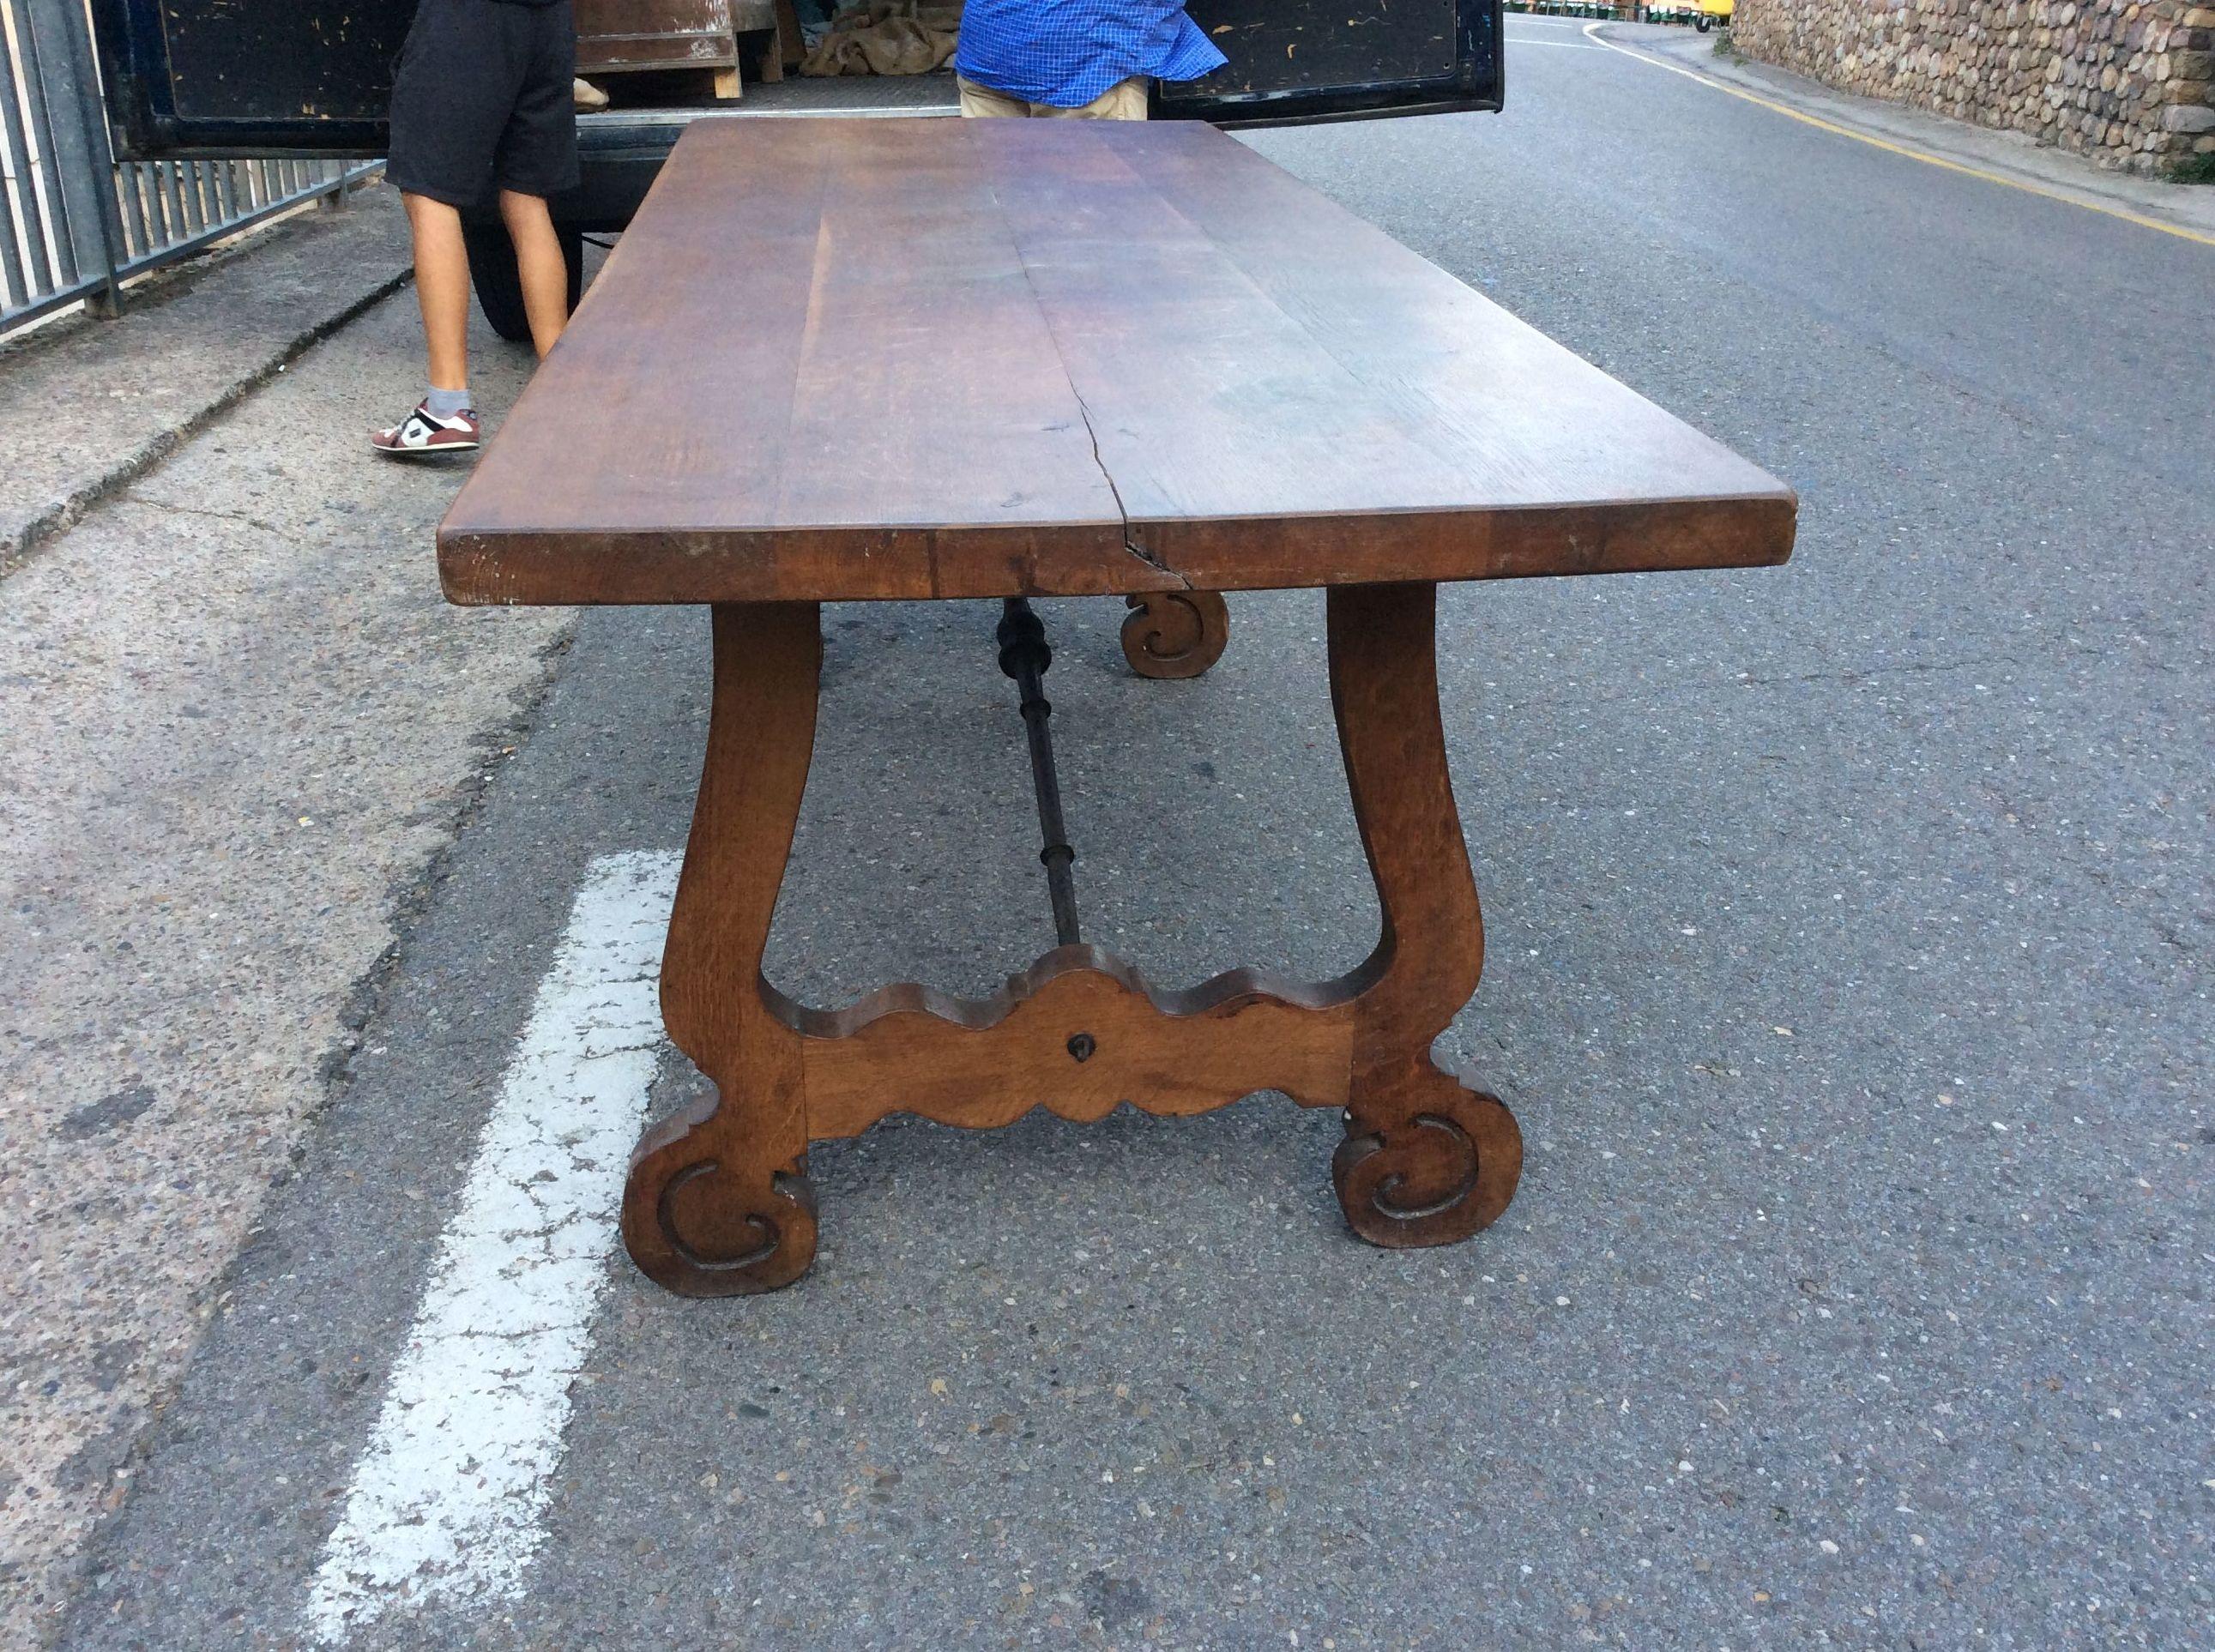 Lendik, restauración de muebles